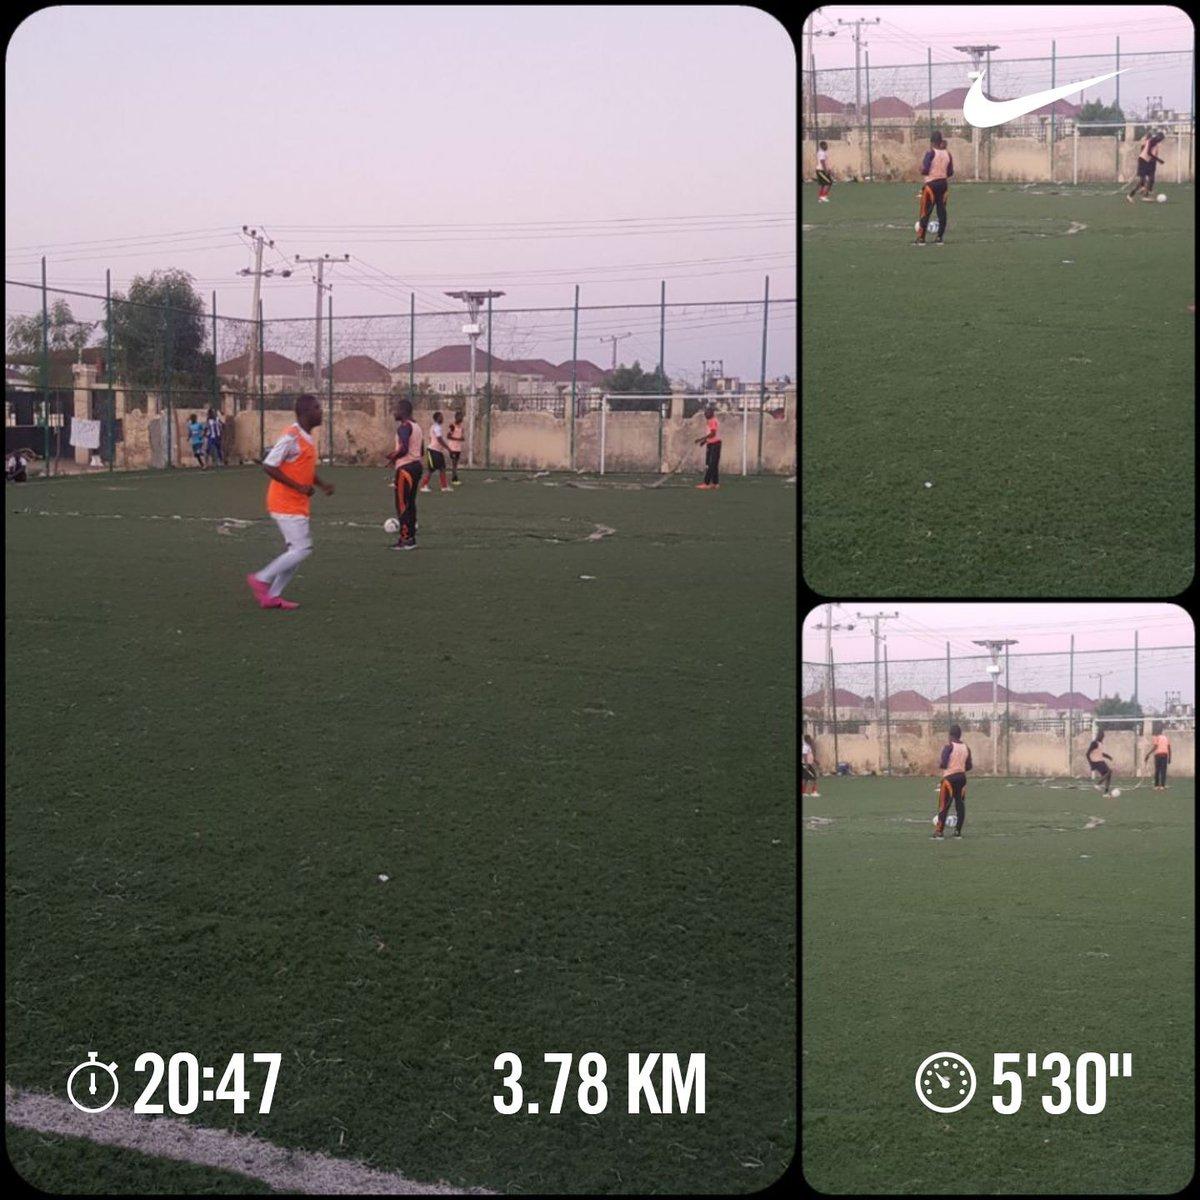 Football Saturday.  3.78km completed. Your own pigeons would fly.  #naijaFittest #runner #nikeplus #fitfam #strava #GoogleFit #itsAmarathon #ItsALifestyle #IamAccountable #yourturn   🤣✌🏃♂️💪🔥🇳🇬👌✅